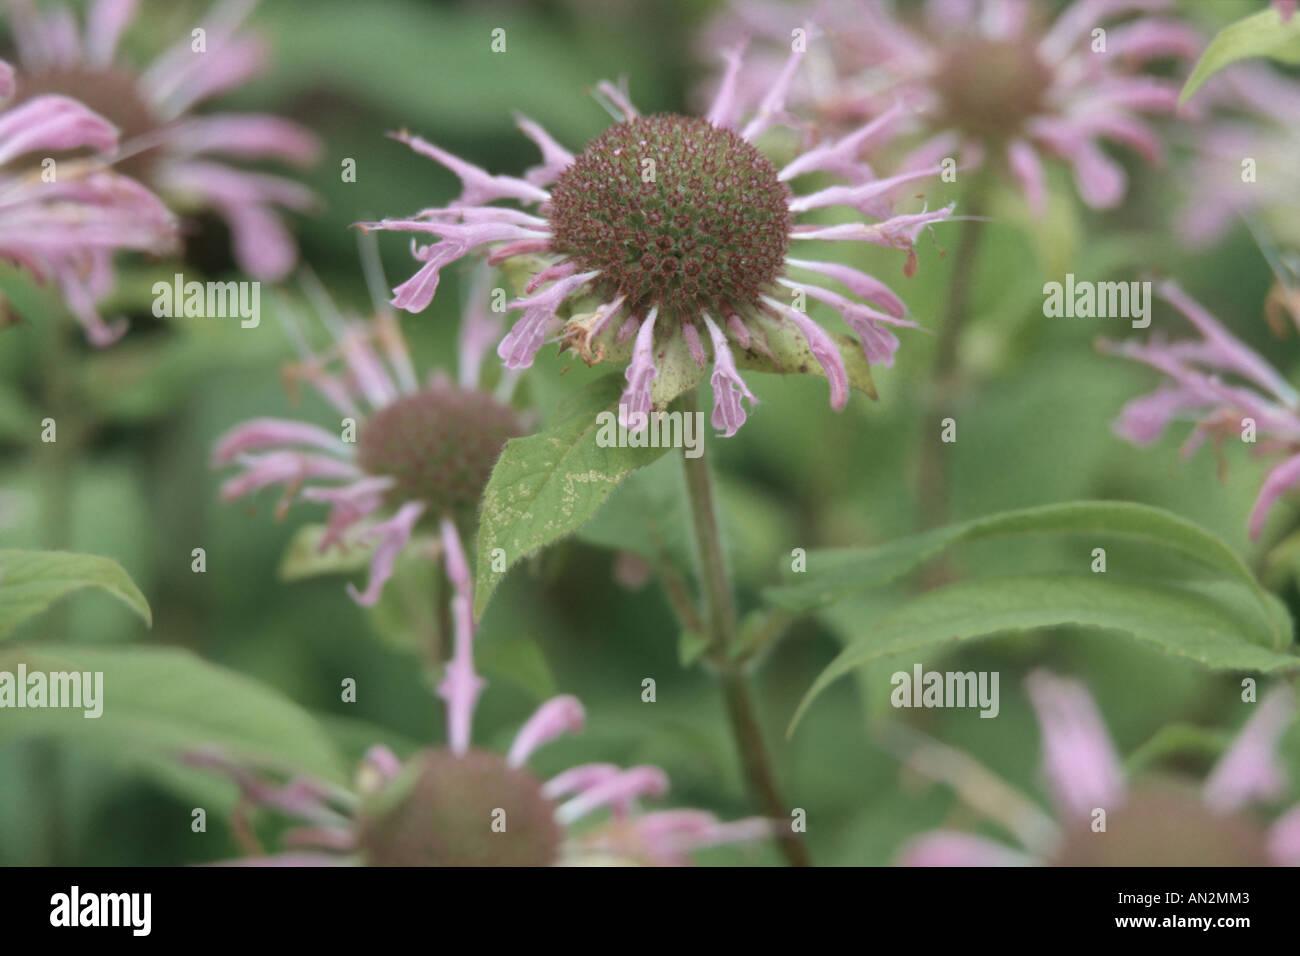 bee balm, oswego tea (Monarda didyma), inflorescences - Stock Image